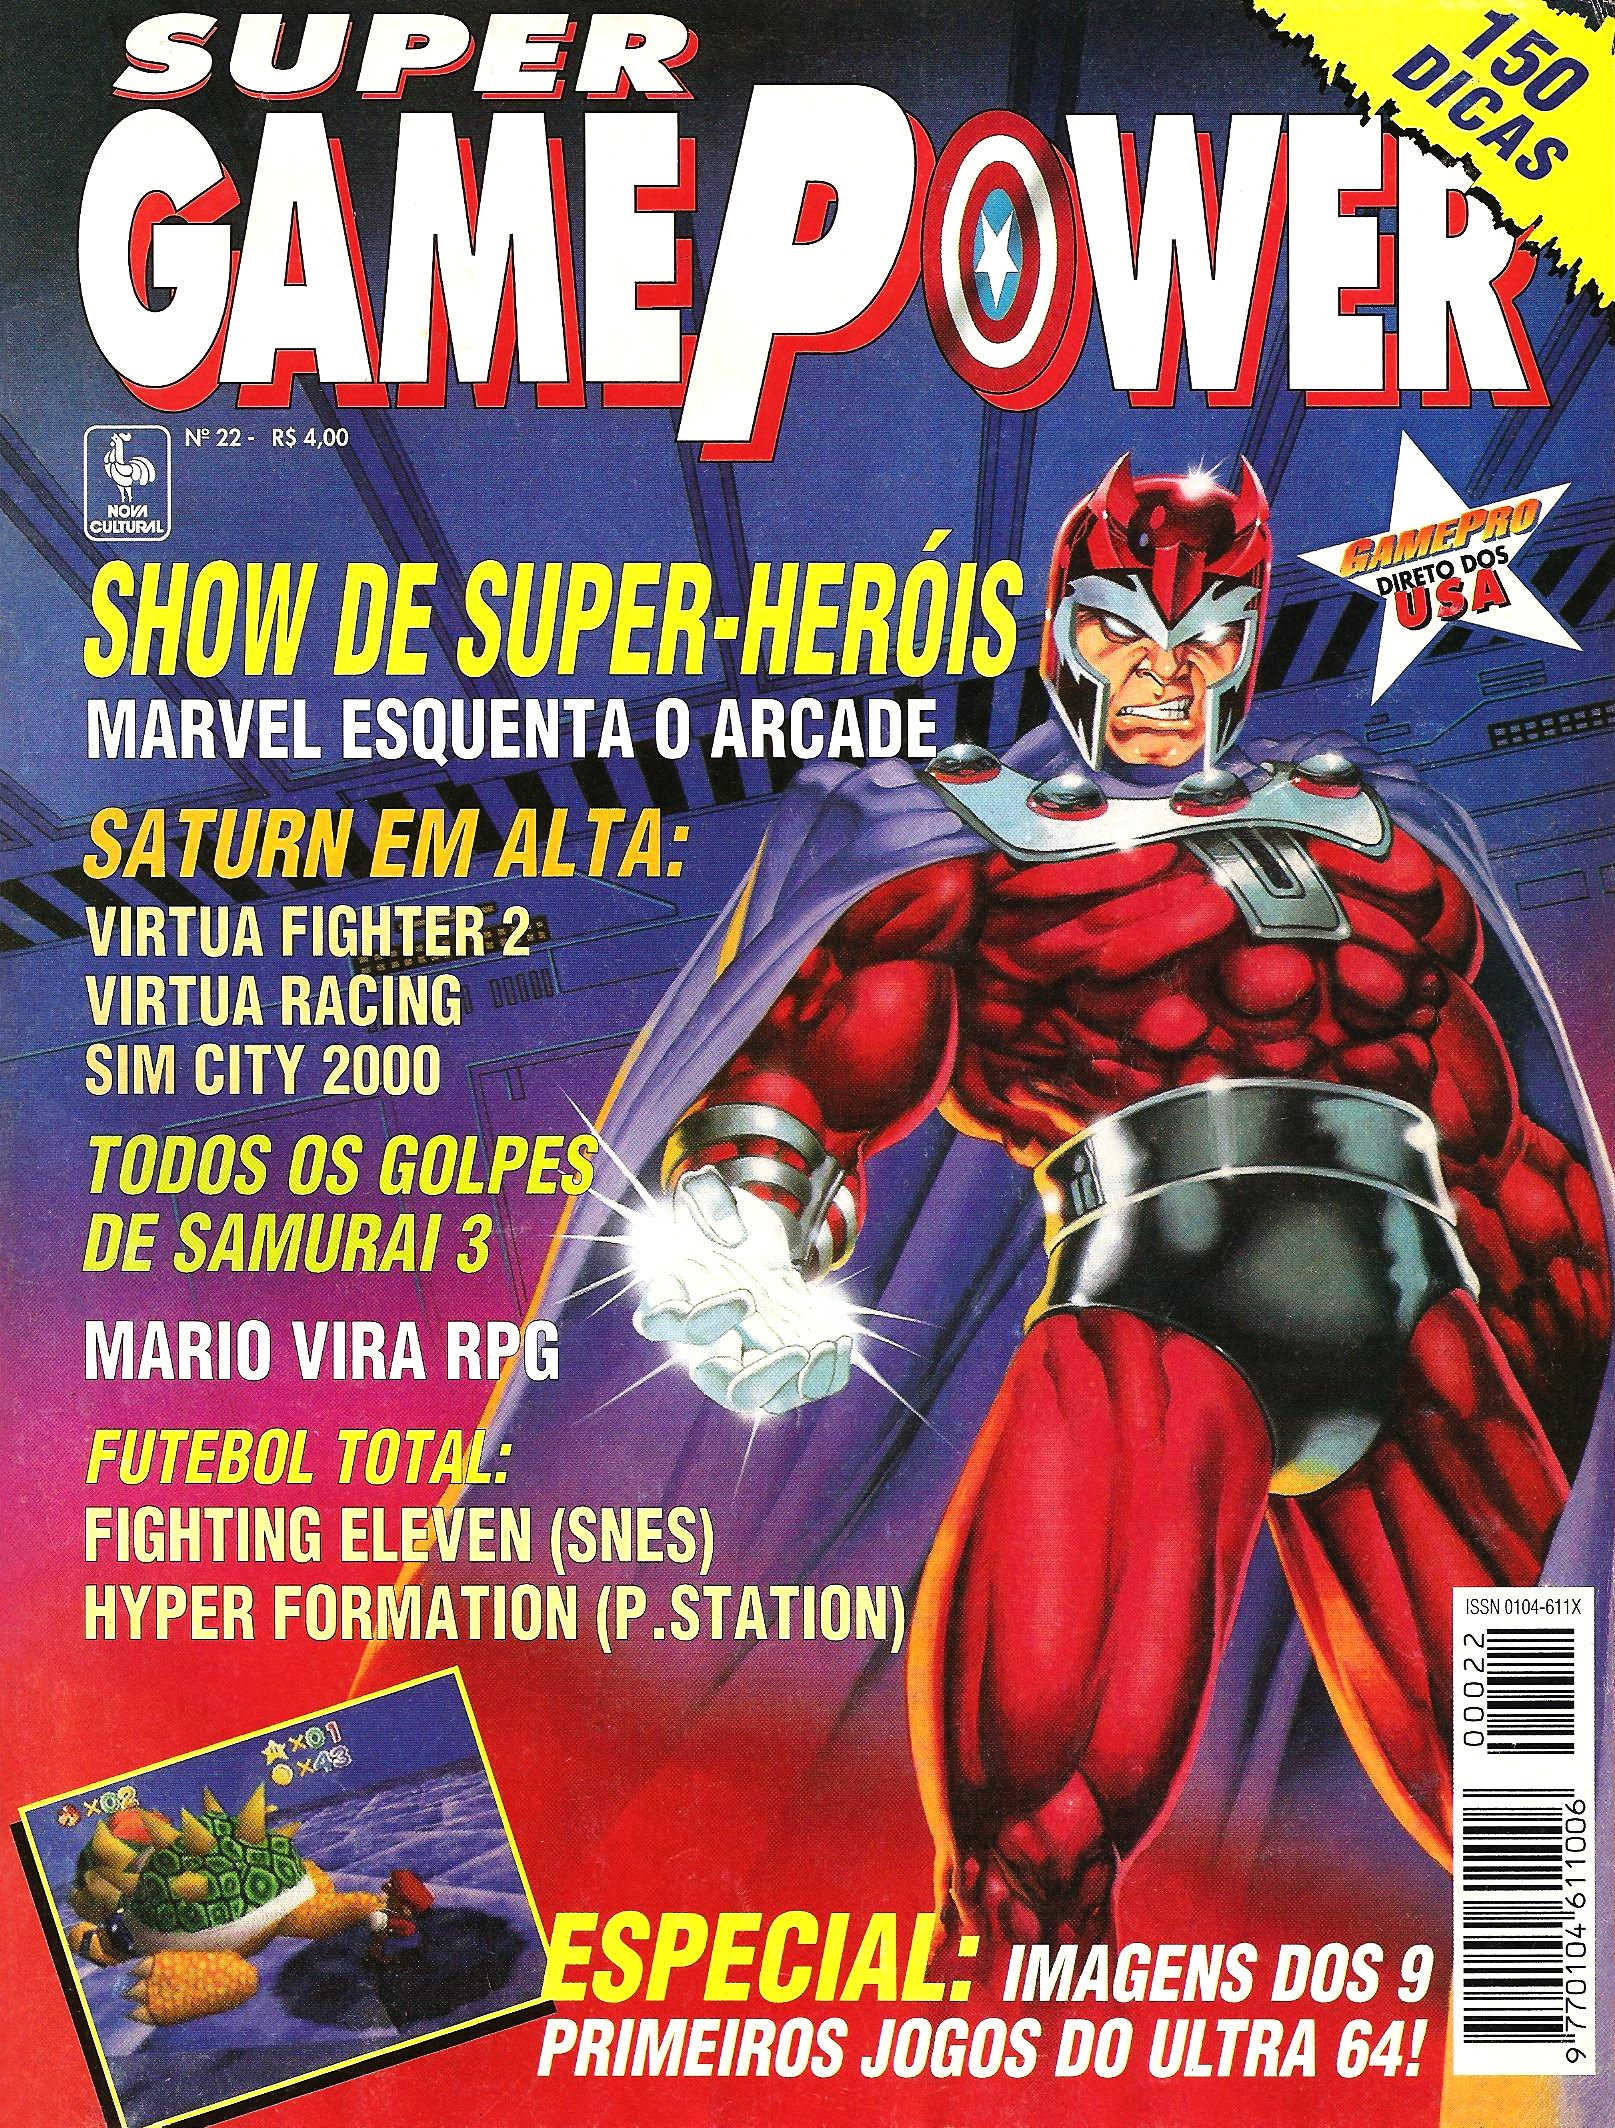 SuperGamePower Issue 022 (January 1996)